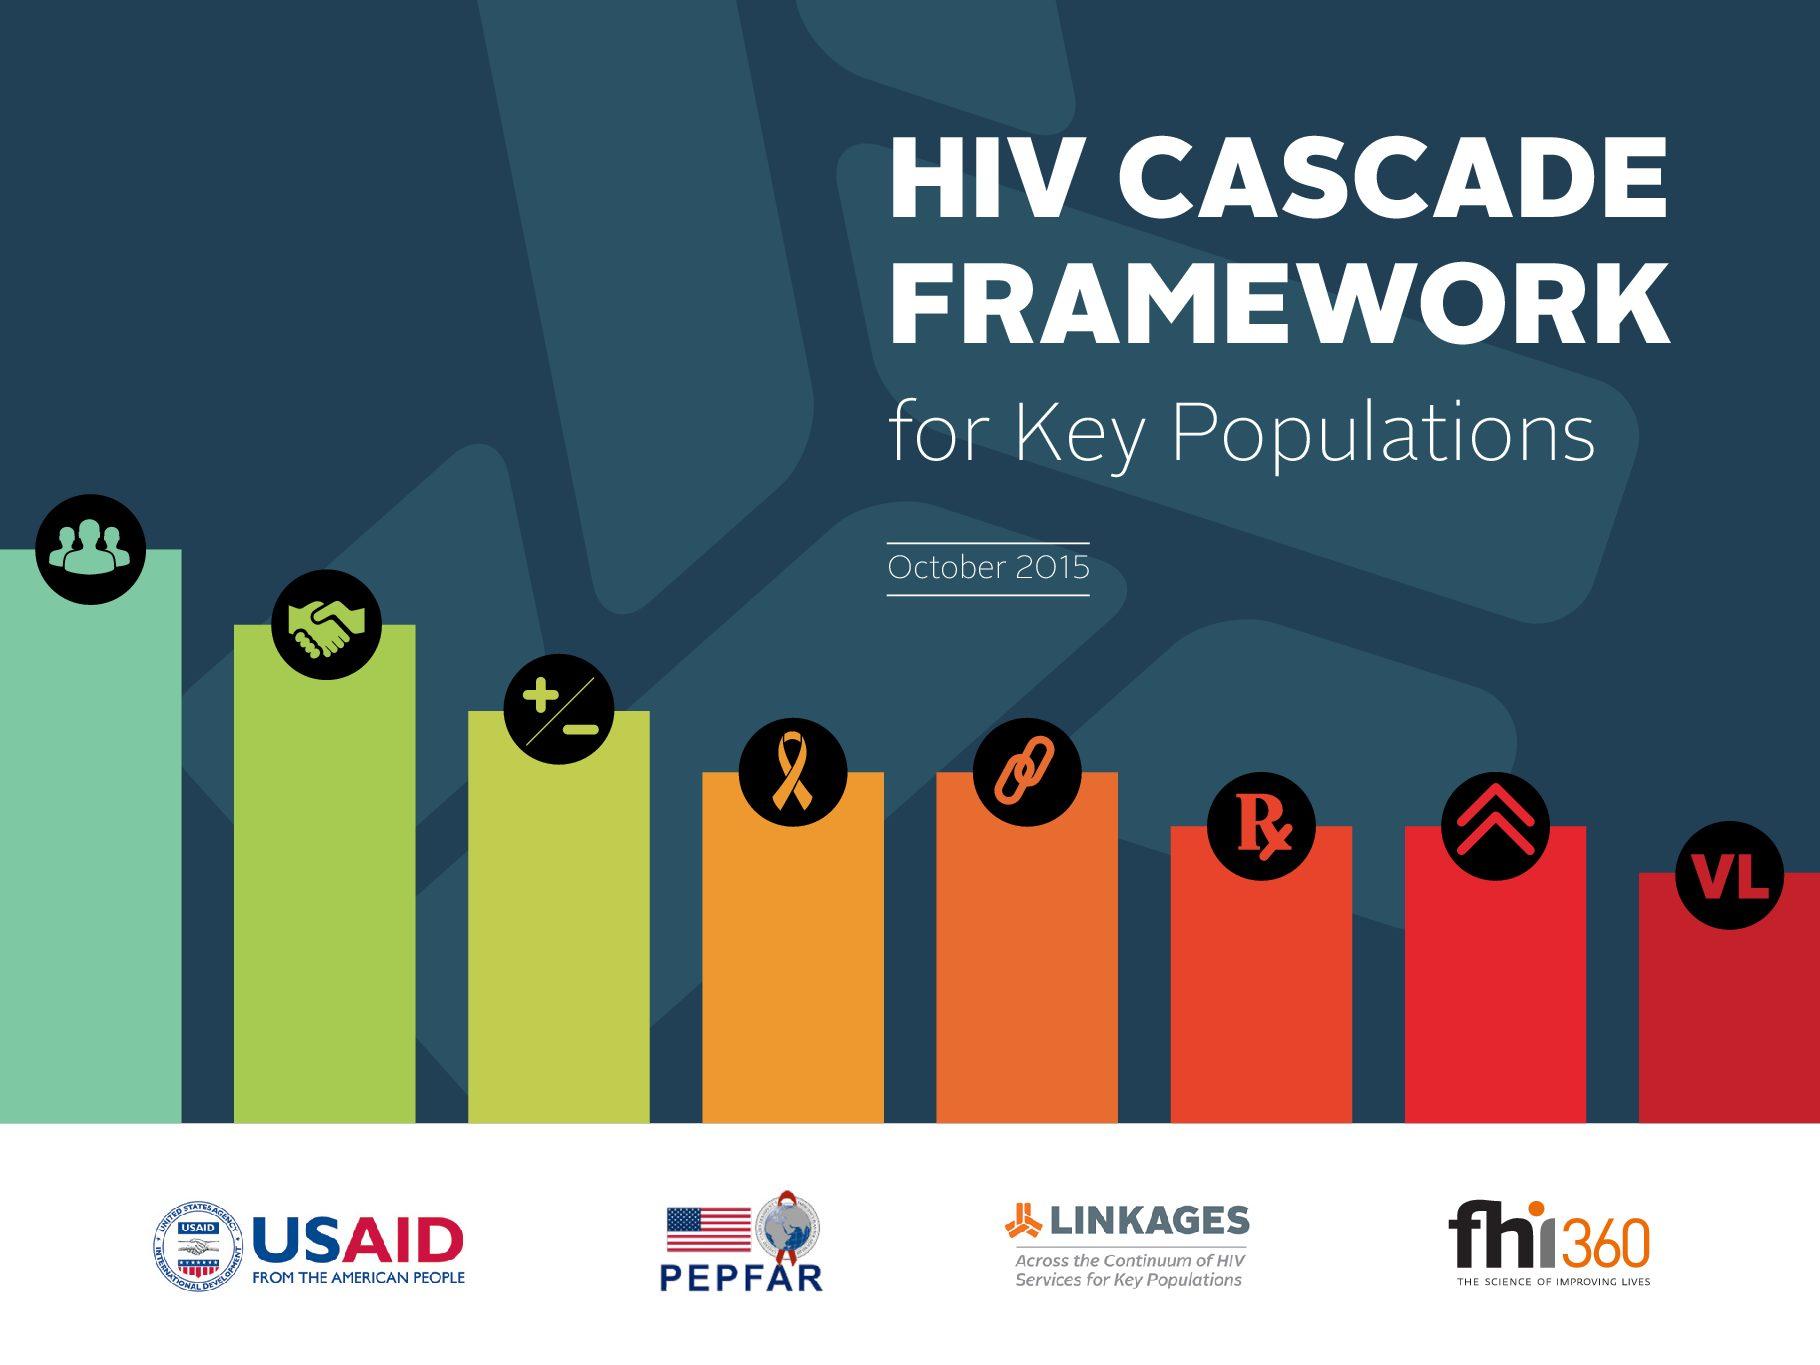 FHI HIV cascade framework for key populations. October 2015.